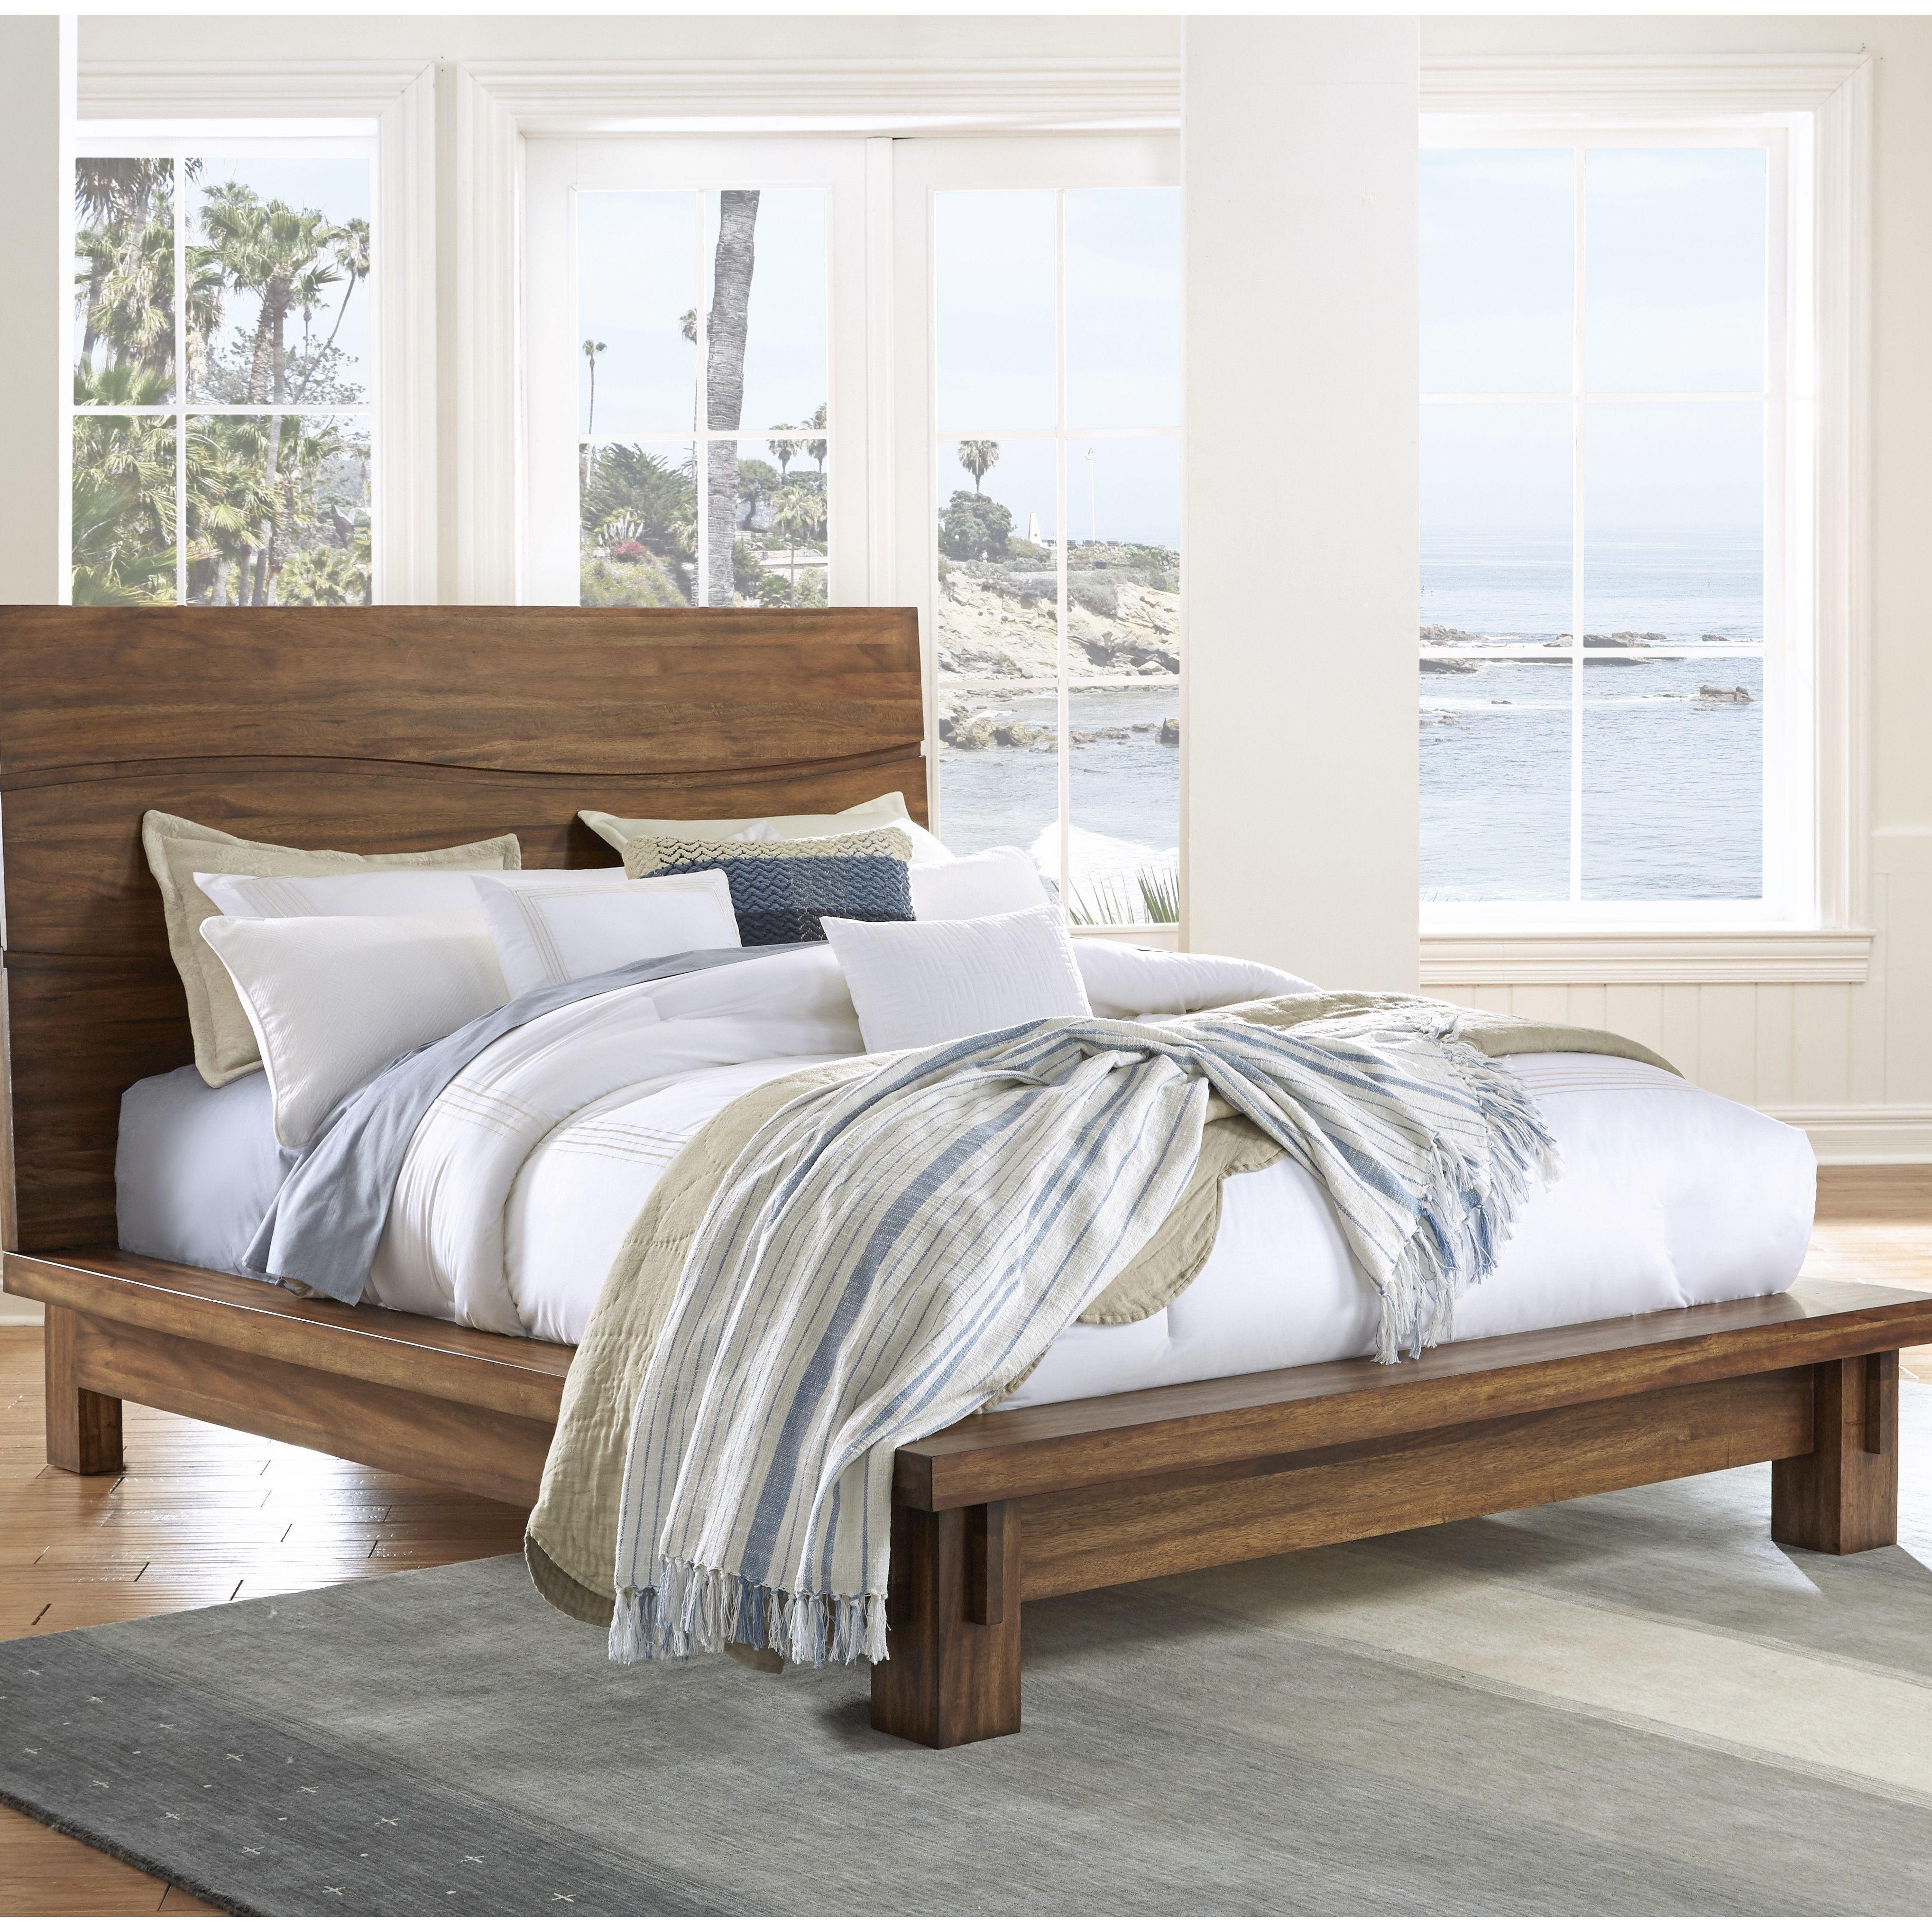 World Menagerie Austin Platform Bed Murphy bed plans